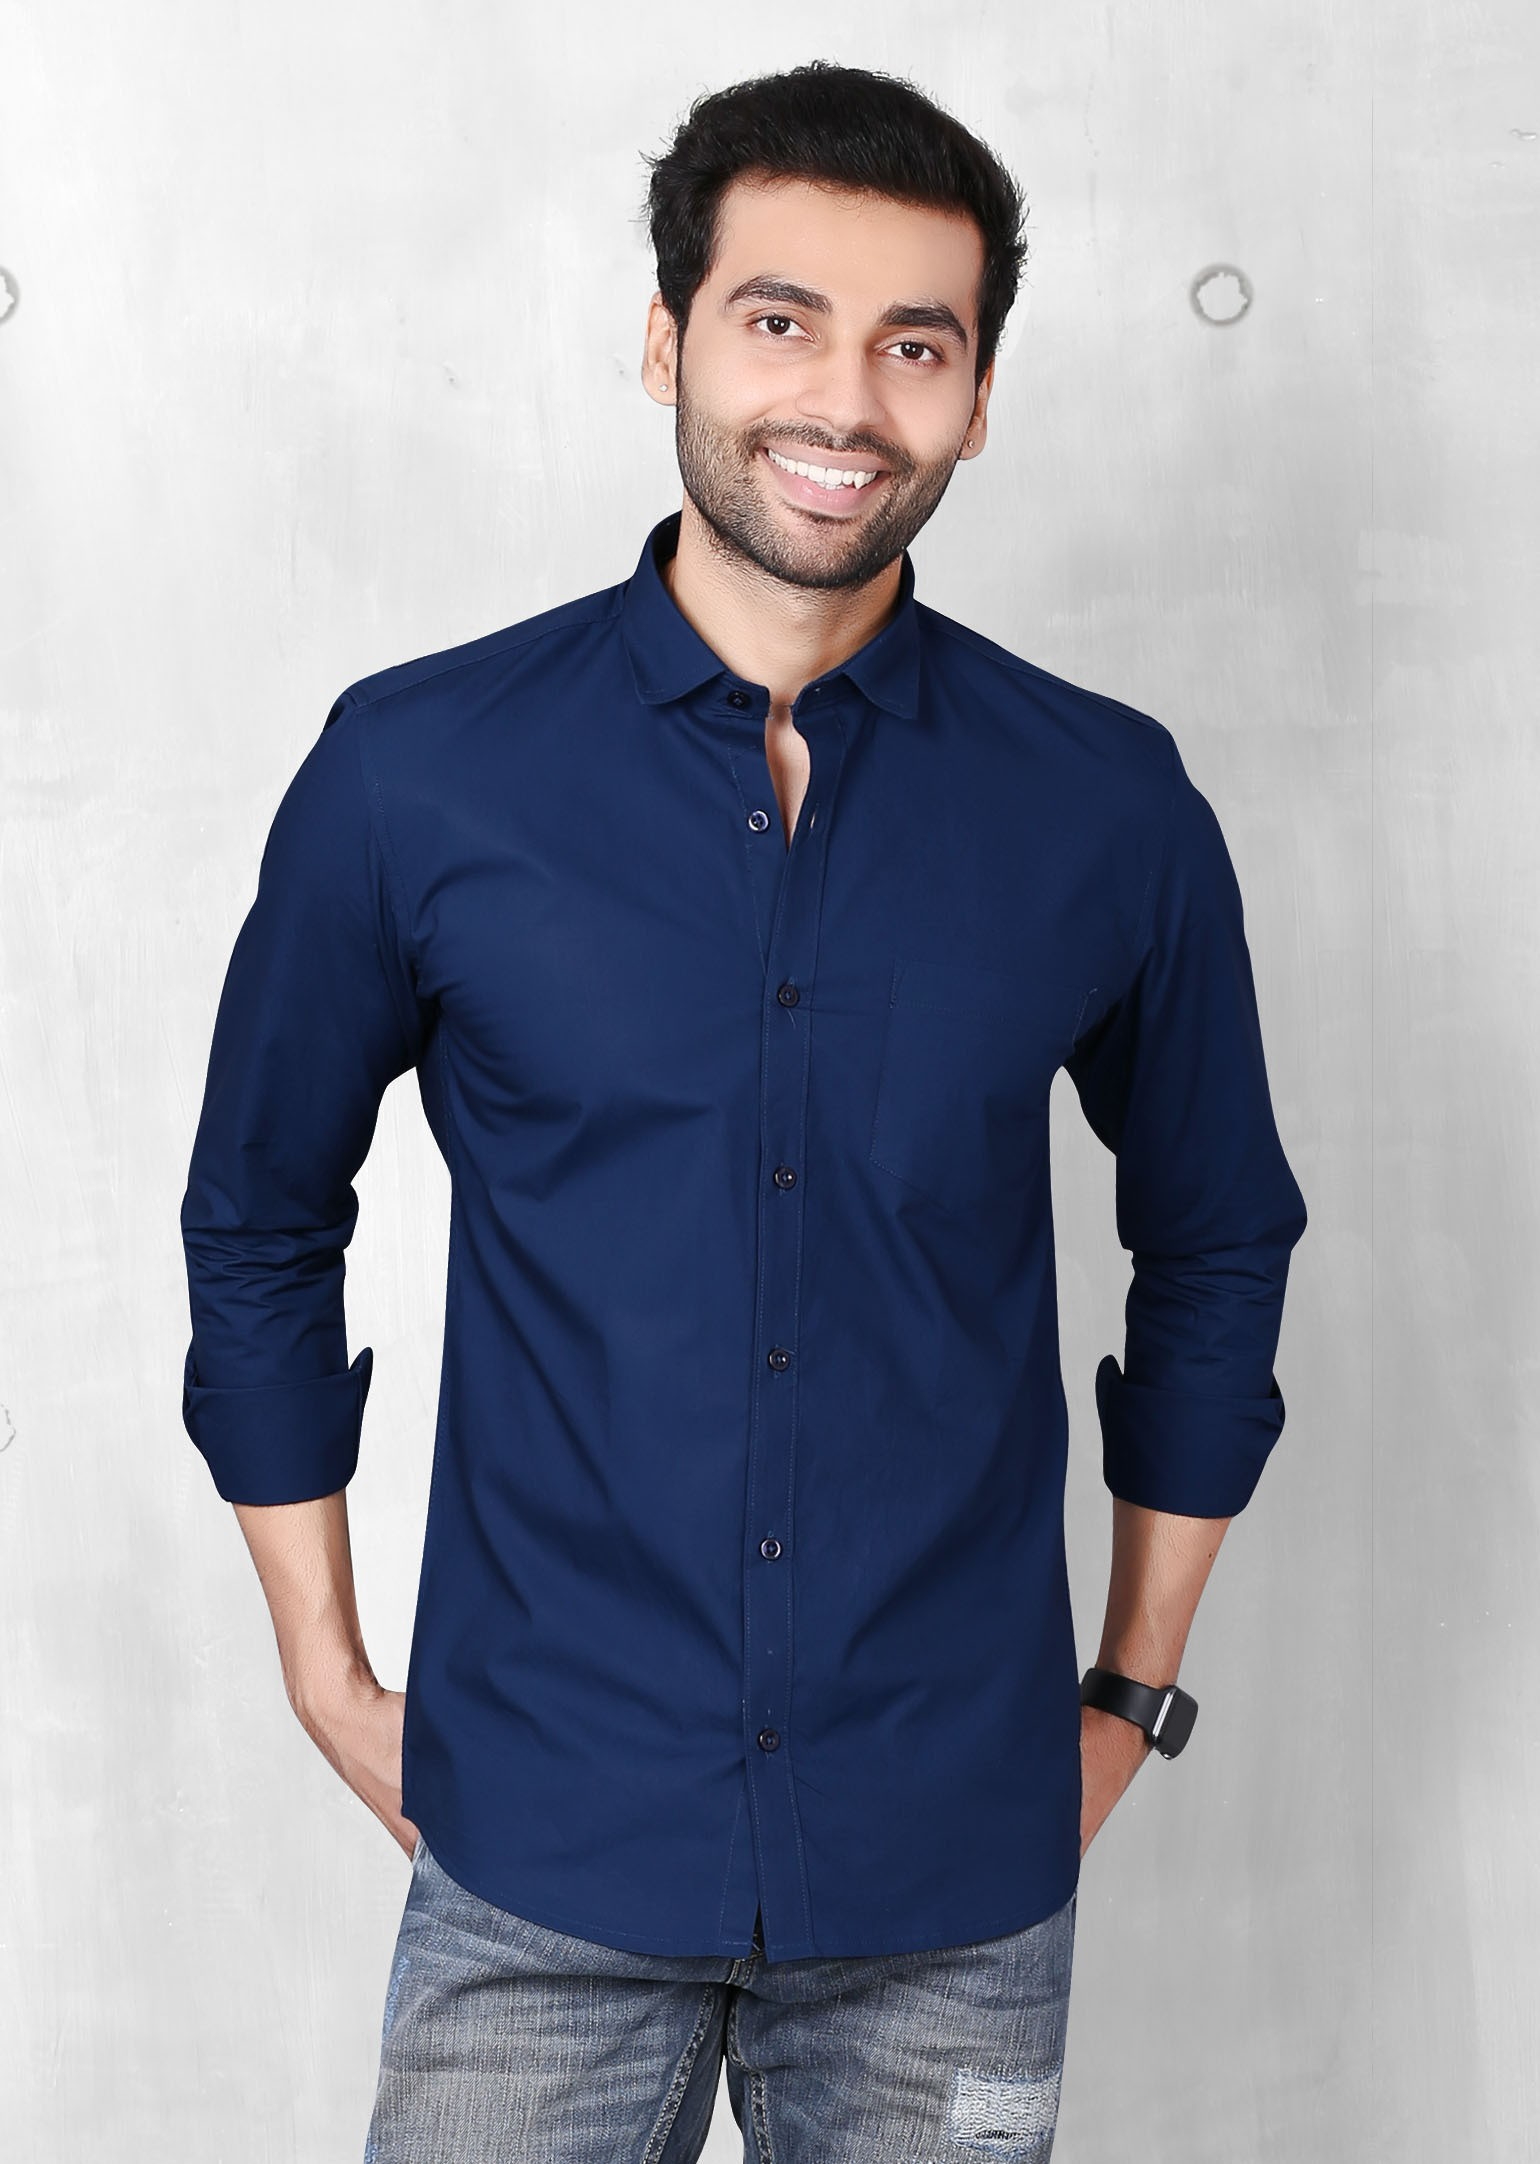 FIFTH ANFOLD Men's Light Blue Casual Slim Collar Full/Long Sleev Slim Fit Shirt